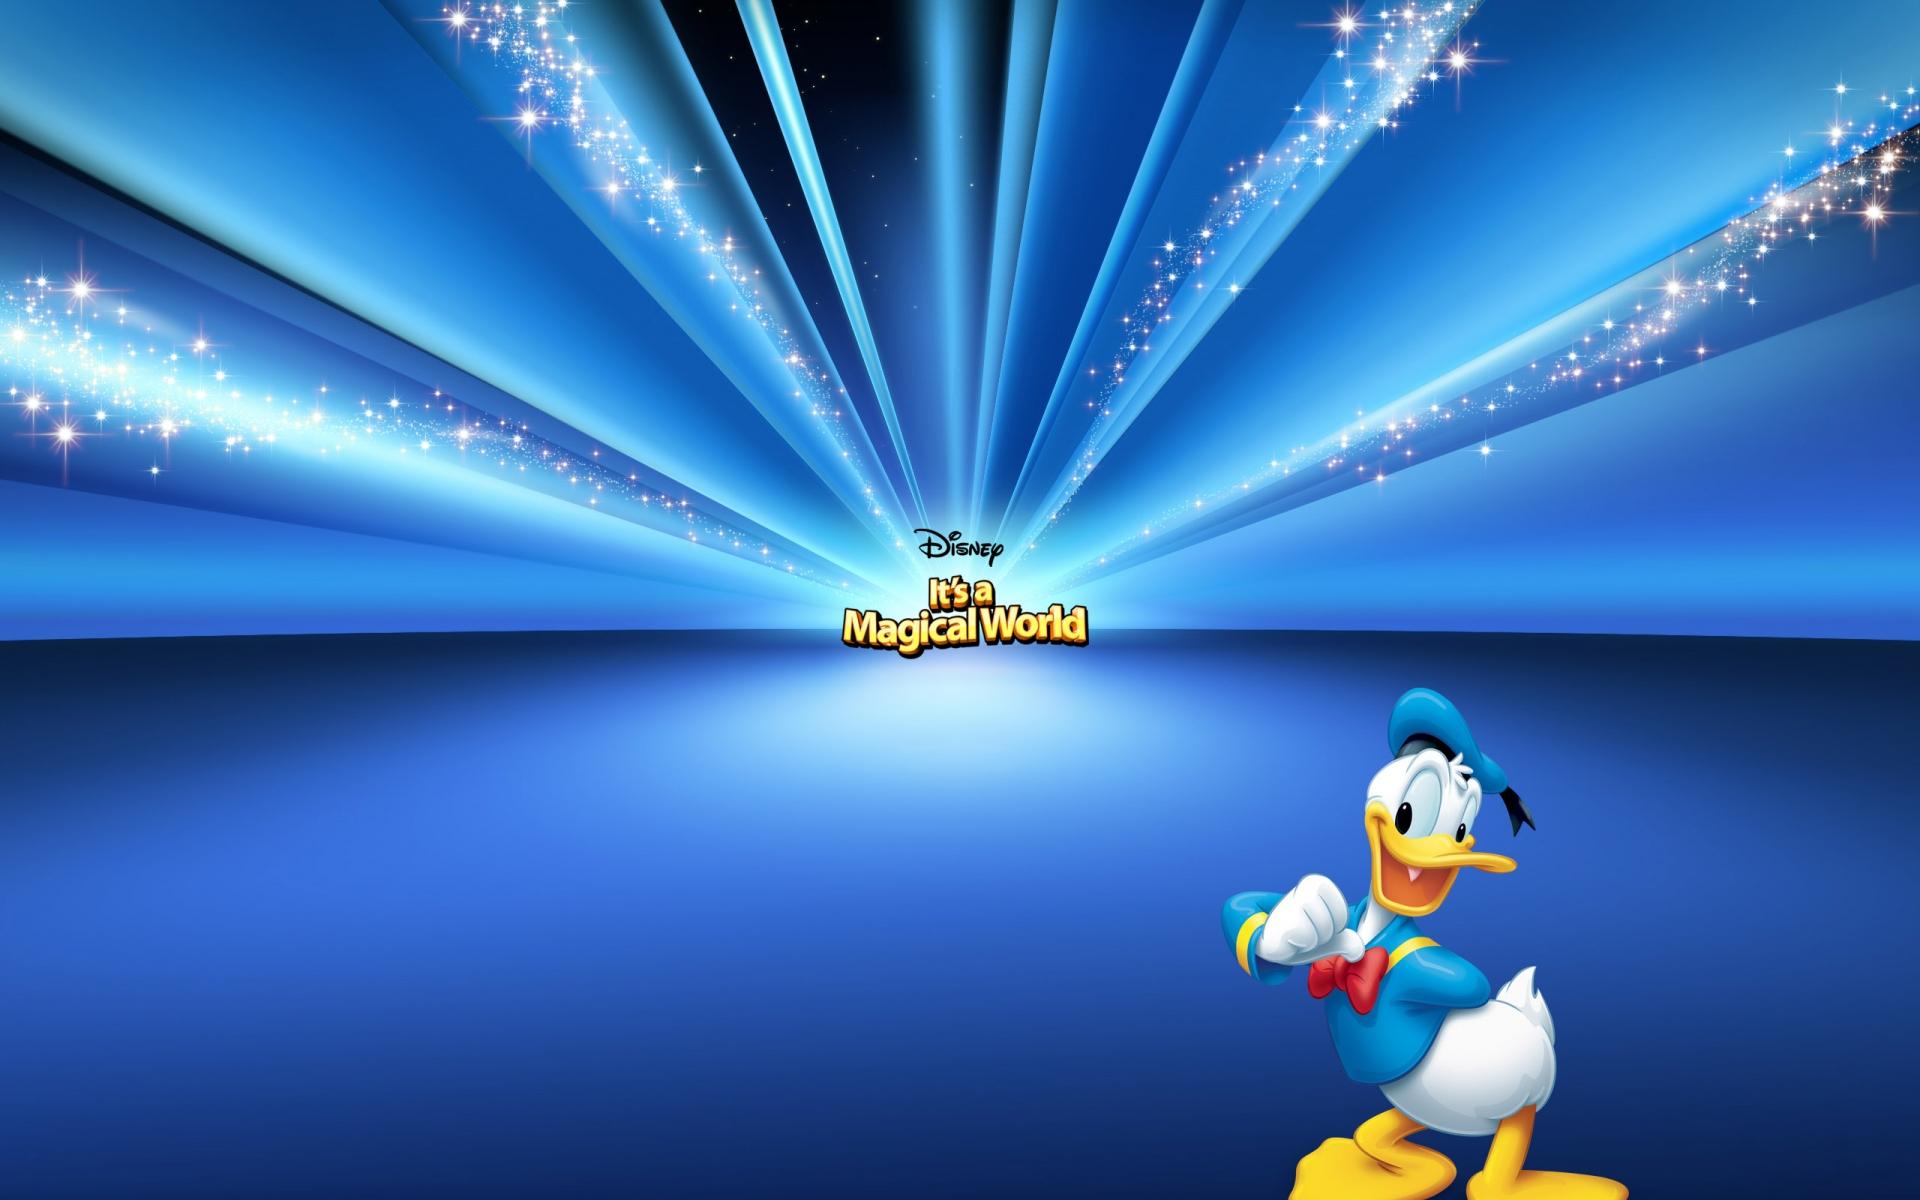 Hd wallpaper themes - 1920x1200 Donald Duck Desktop Pc And Mac Wallpaper